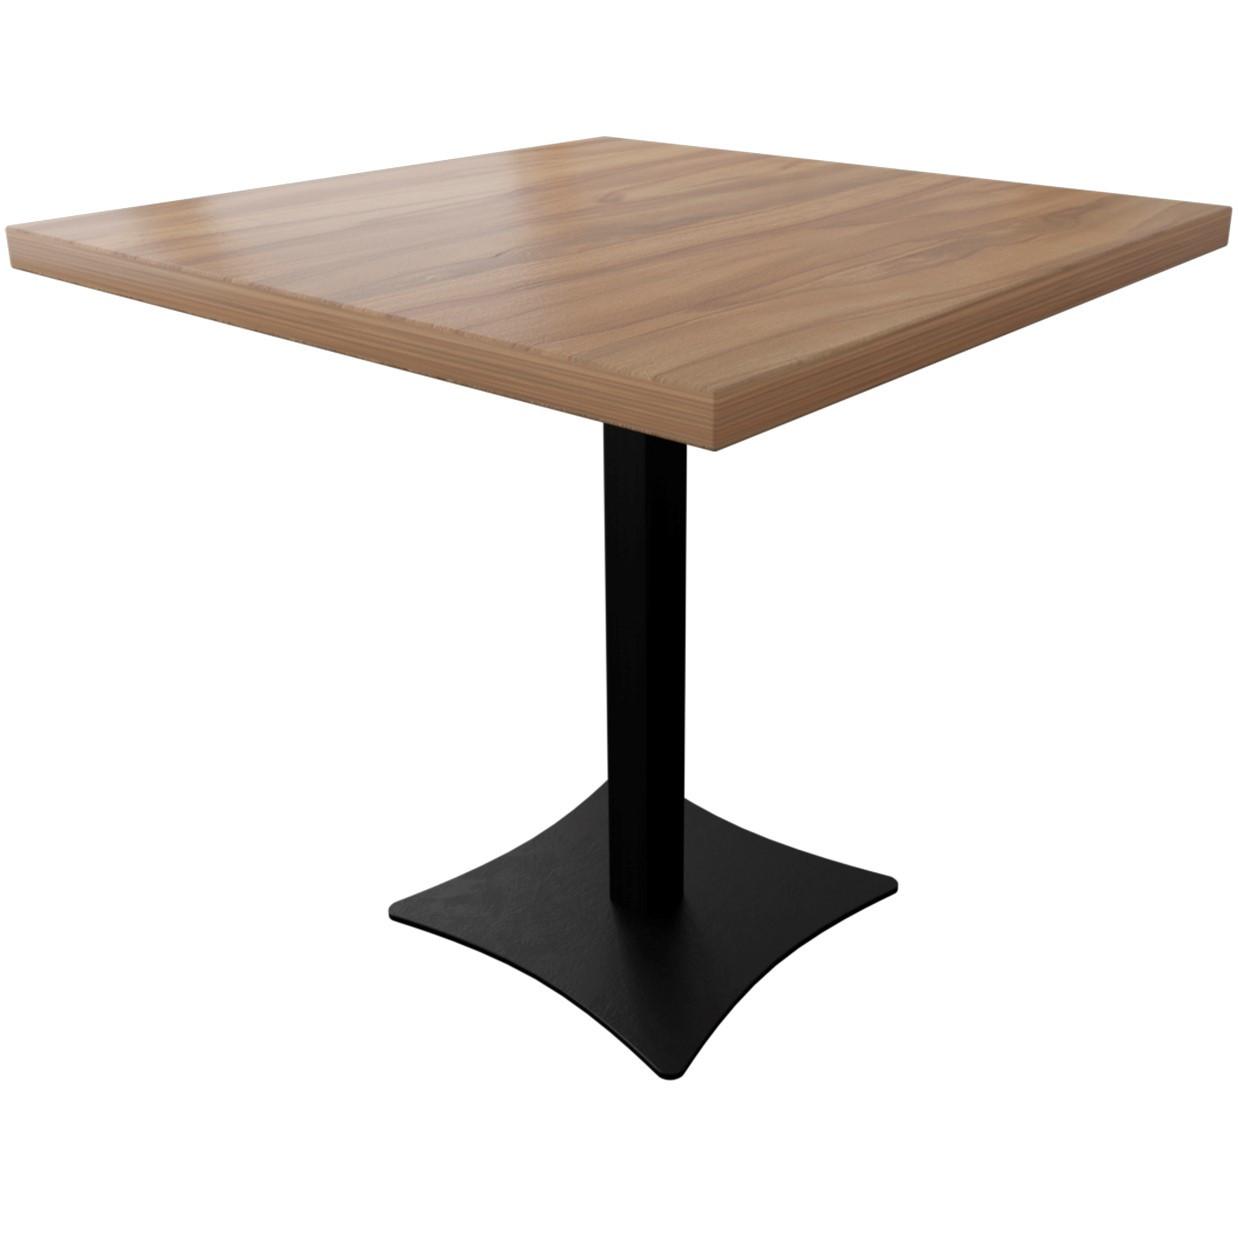 Стол Тренд 3 (серия Loft) ТМ Металл-Дизайн